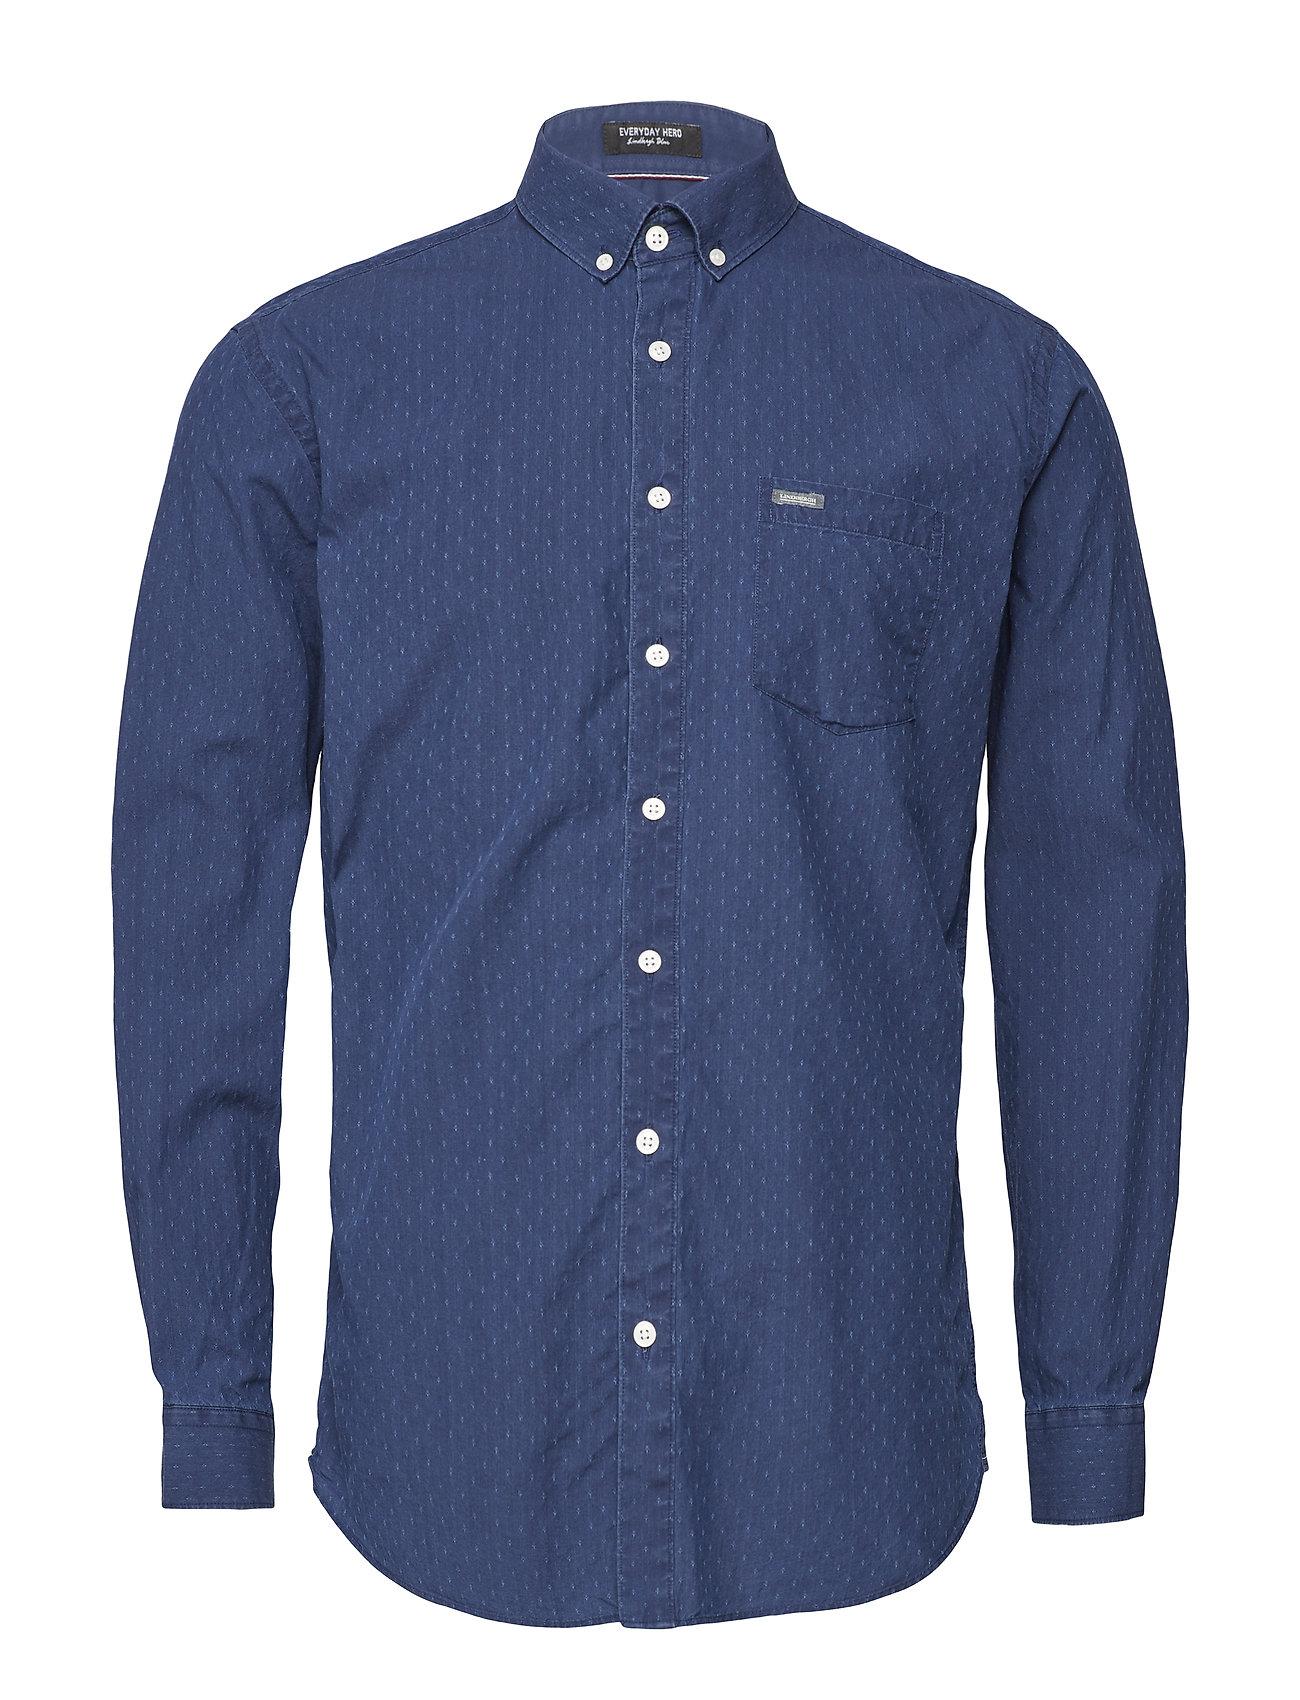 Lindbergh Ditsy jacquard L S shirt Ögrönlar